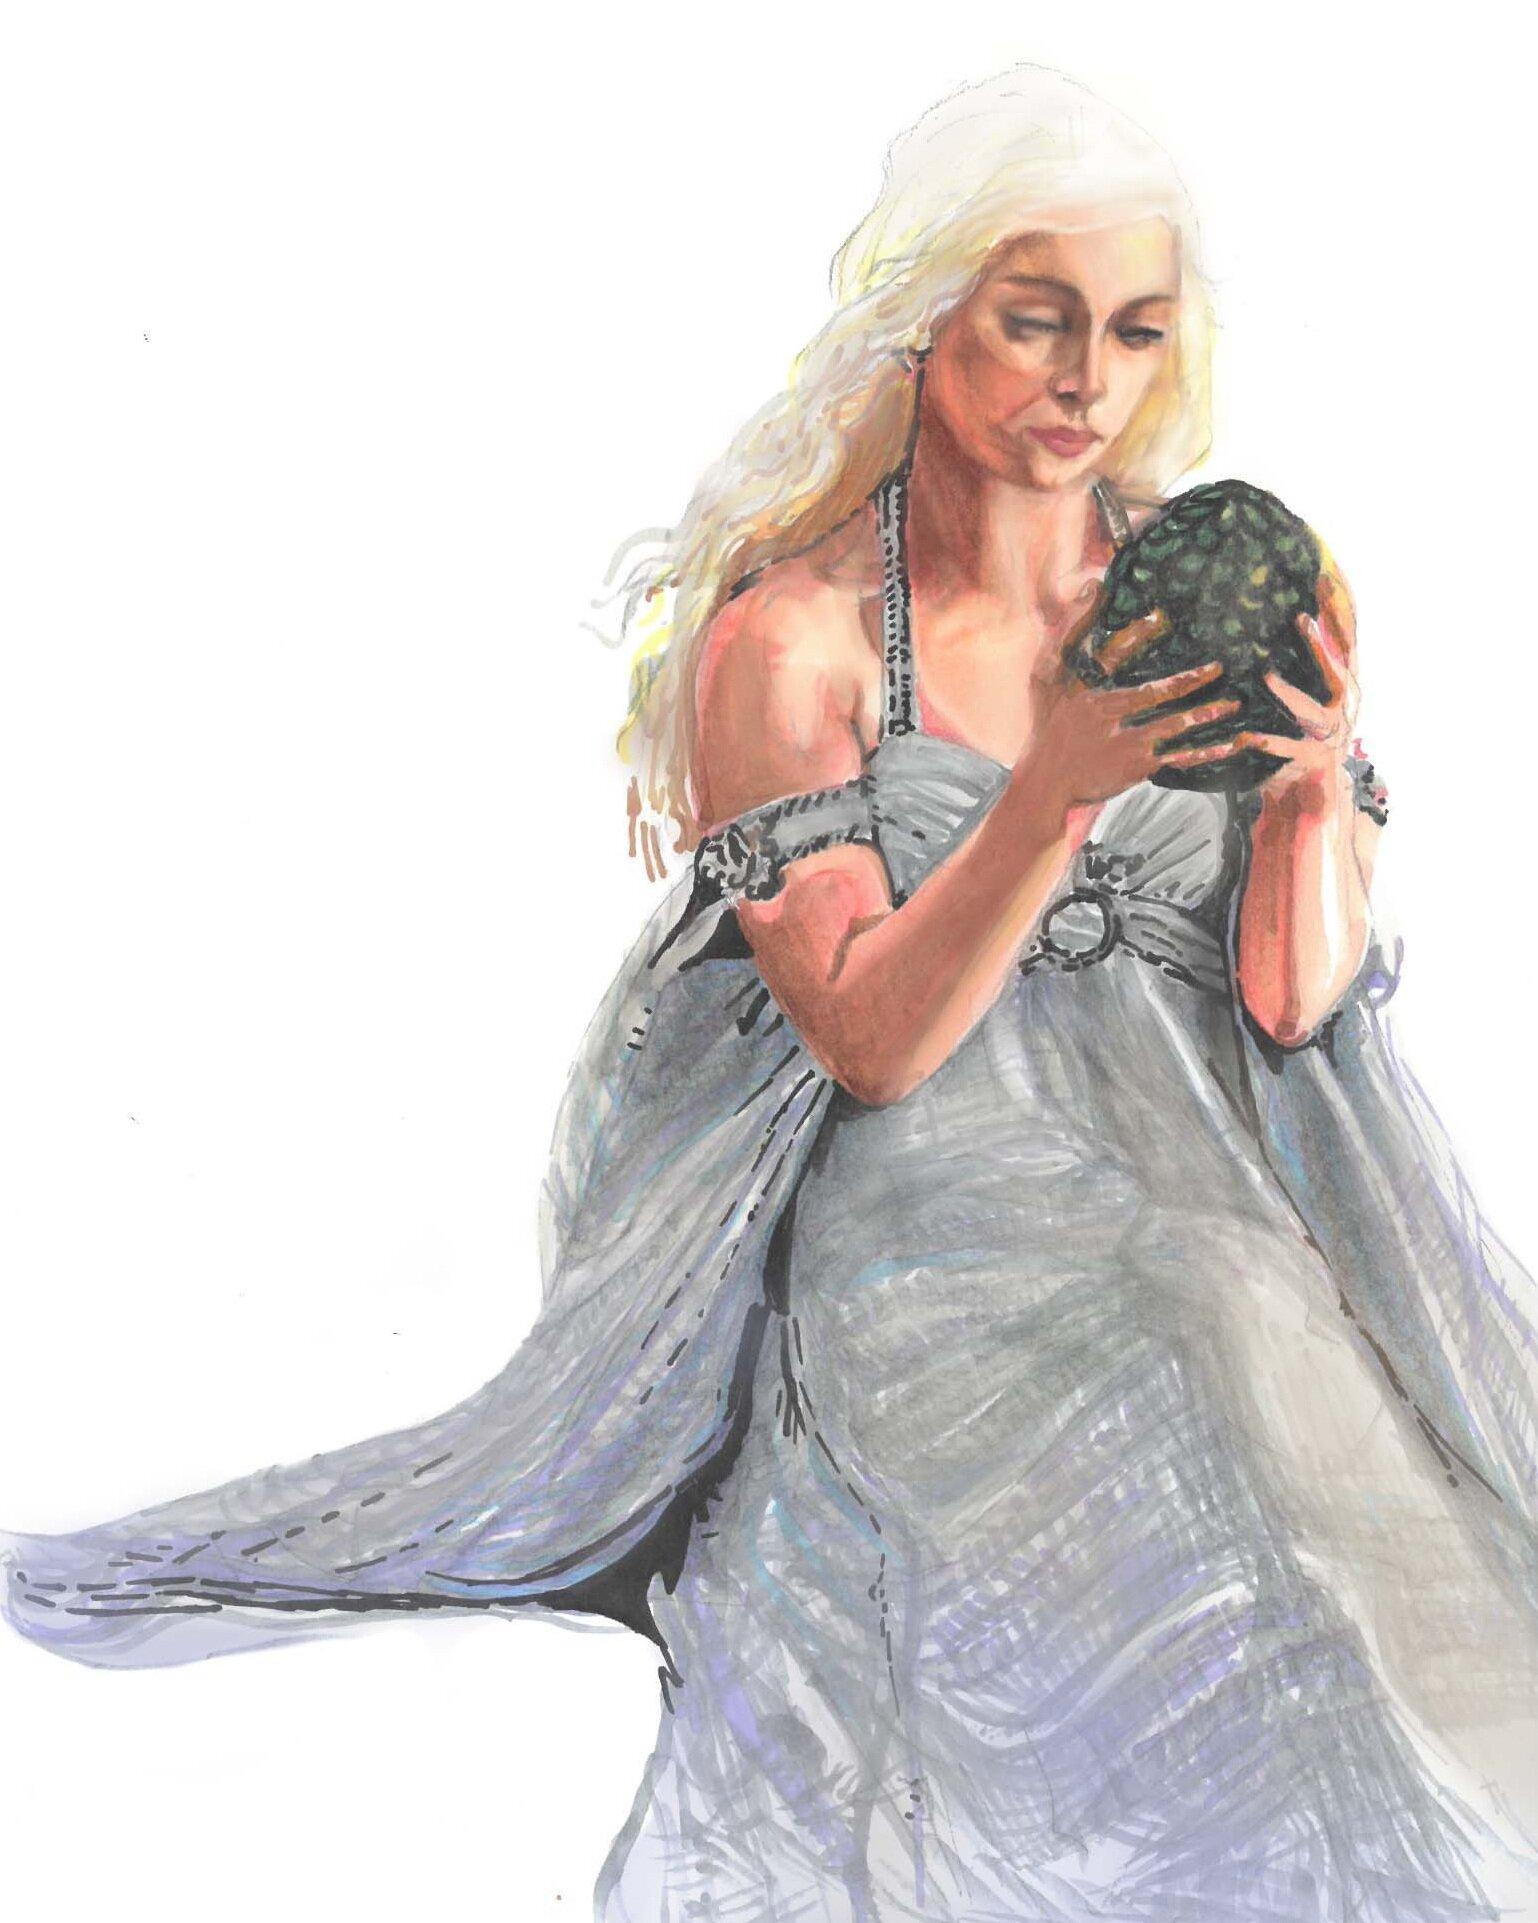 tessa+dines_Daenerys+with+dragon+egg+edited.jpg